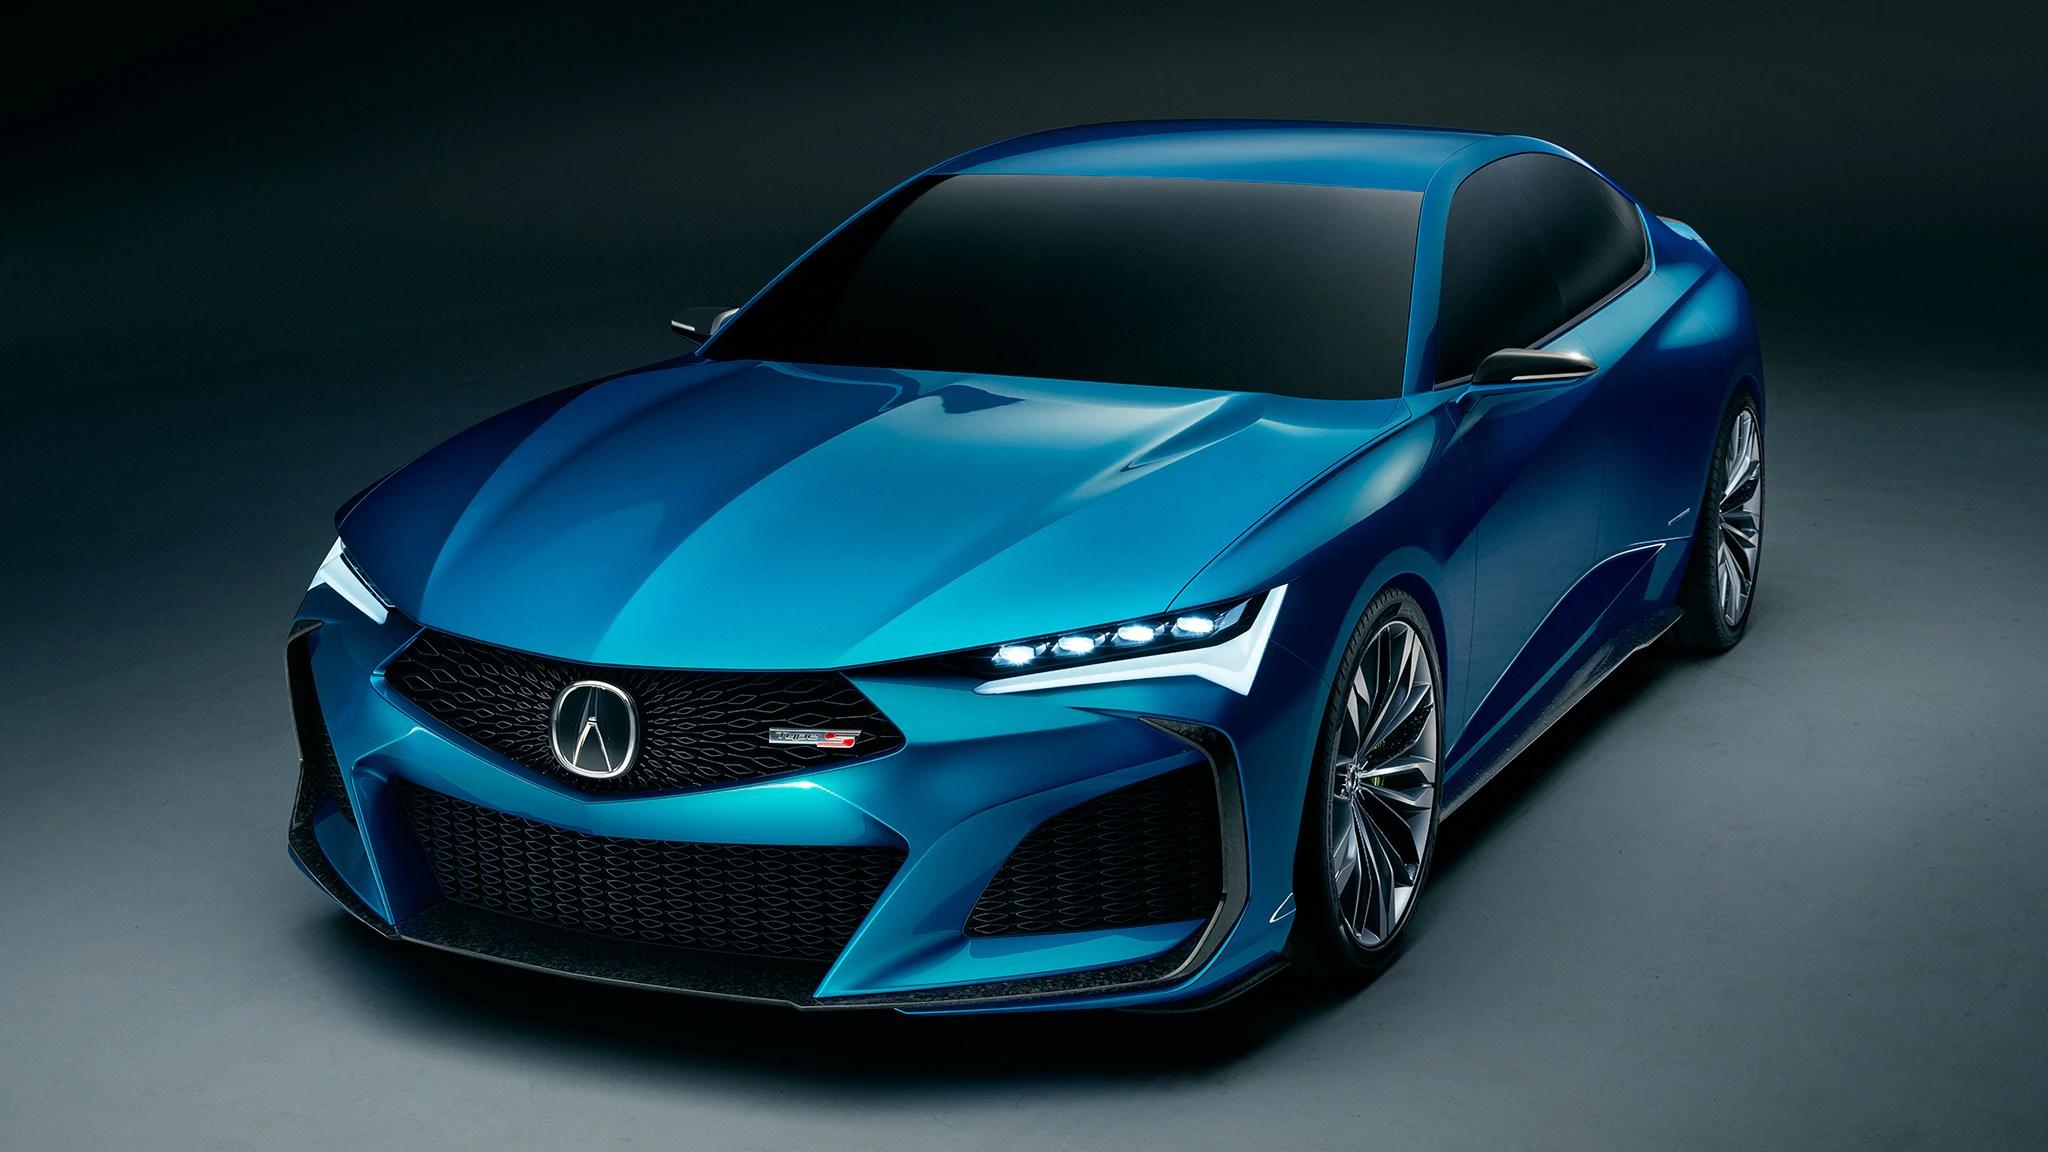 Acura Type S Concept Promises Renewed Focus On Performance